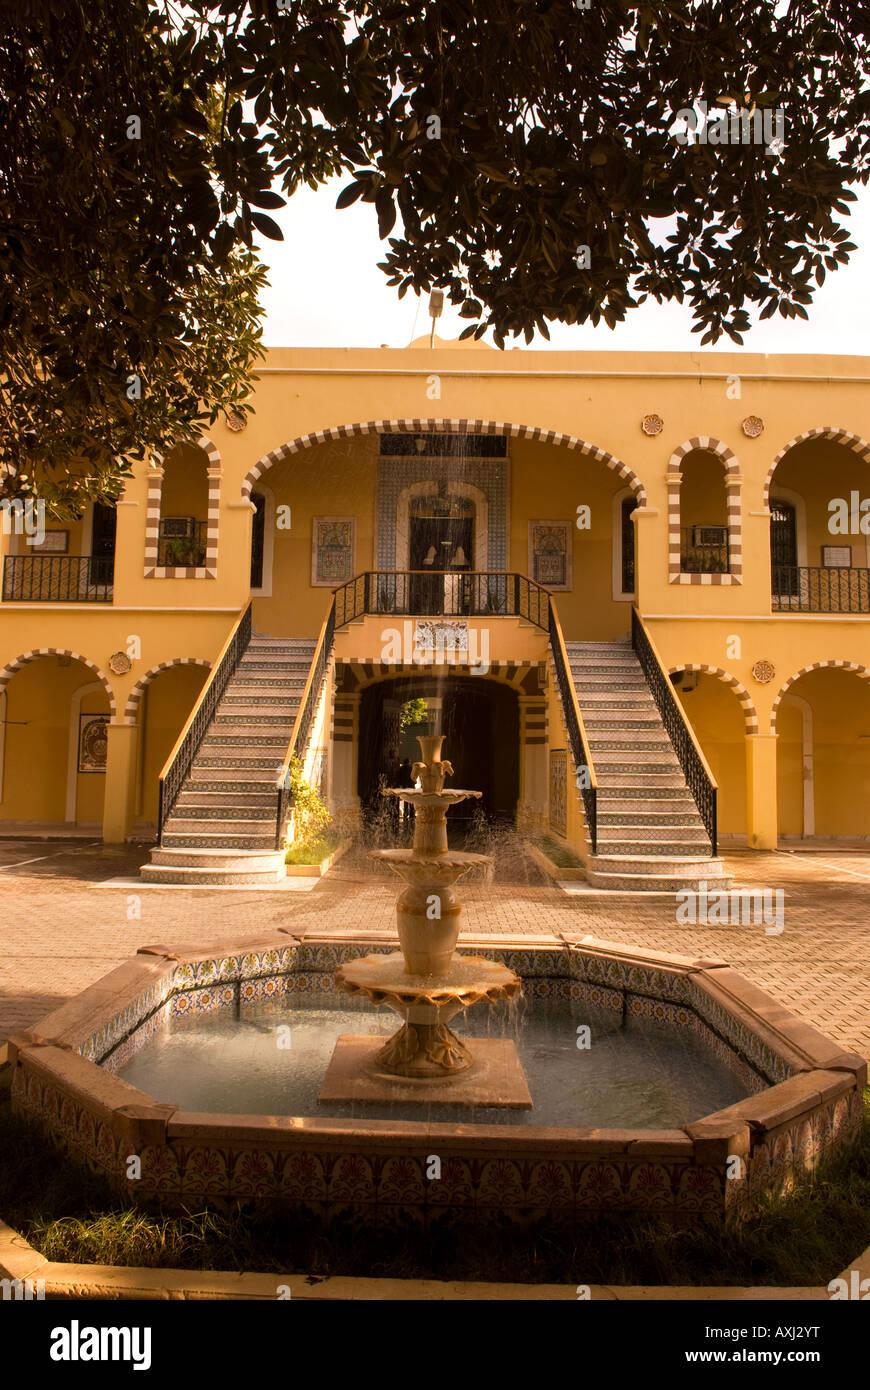 Inside The Islamic Arts And Crafts School Tripoli Libya